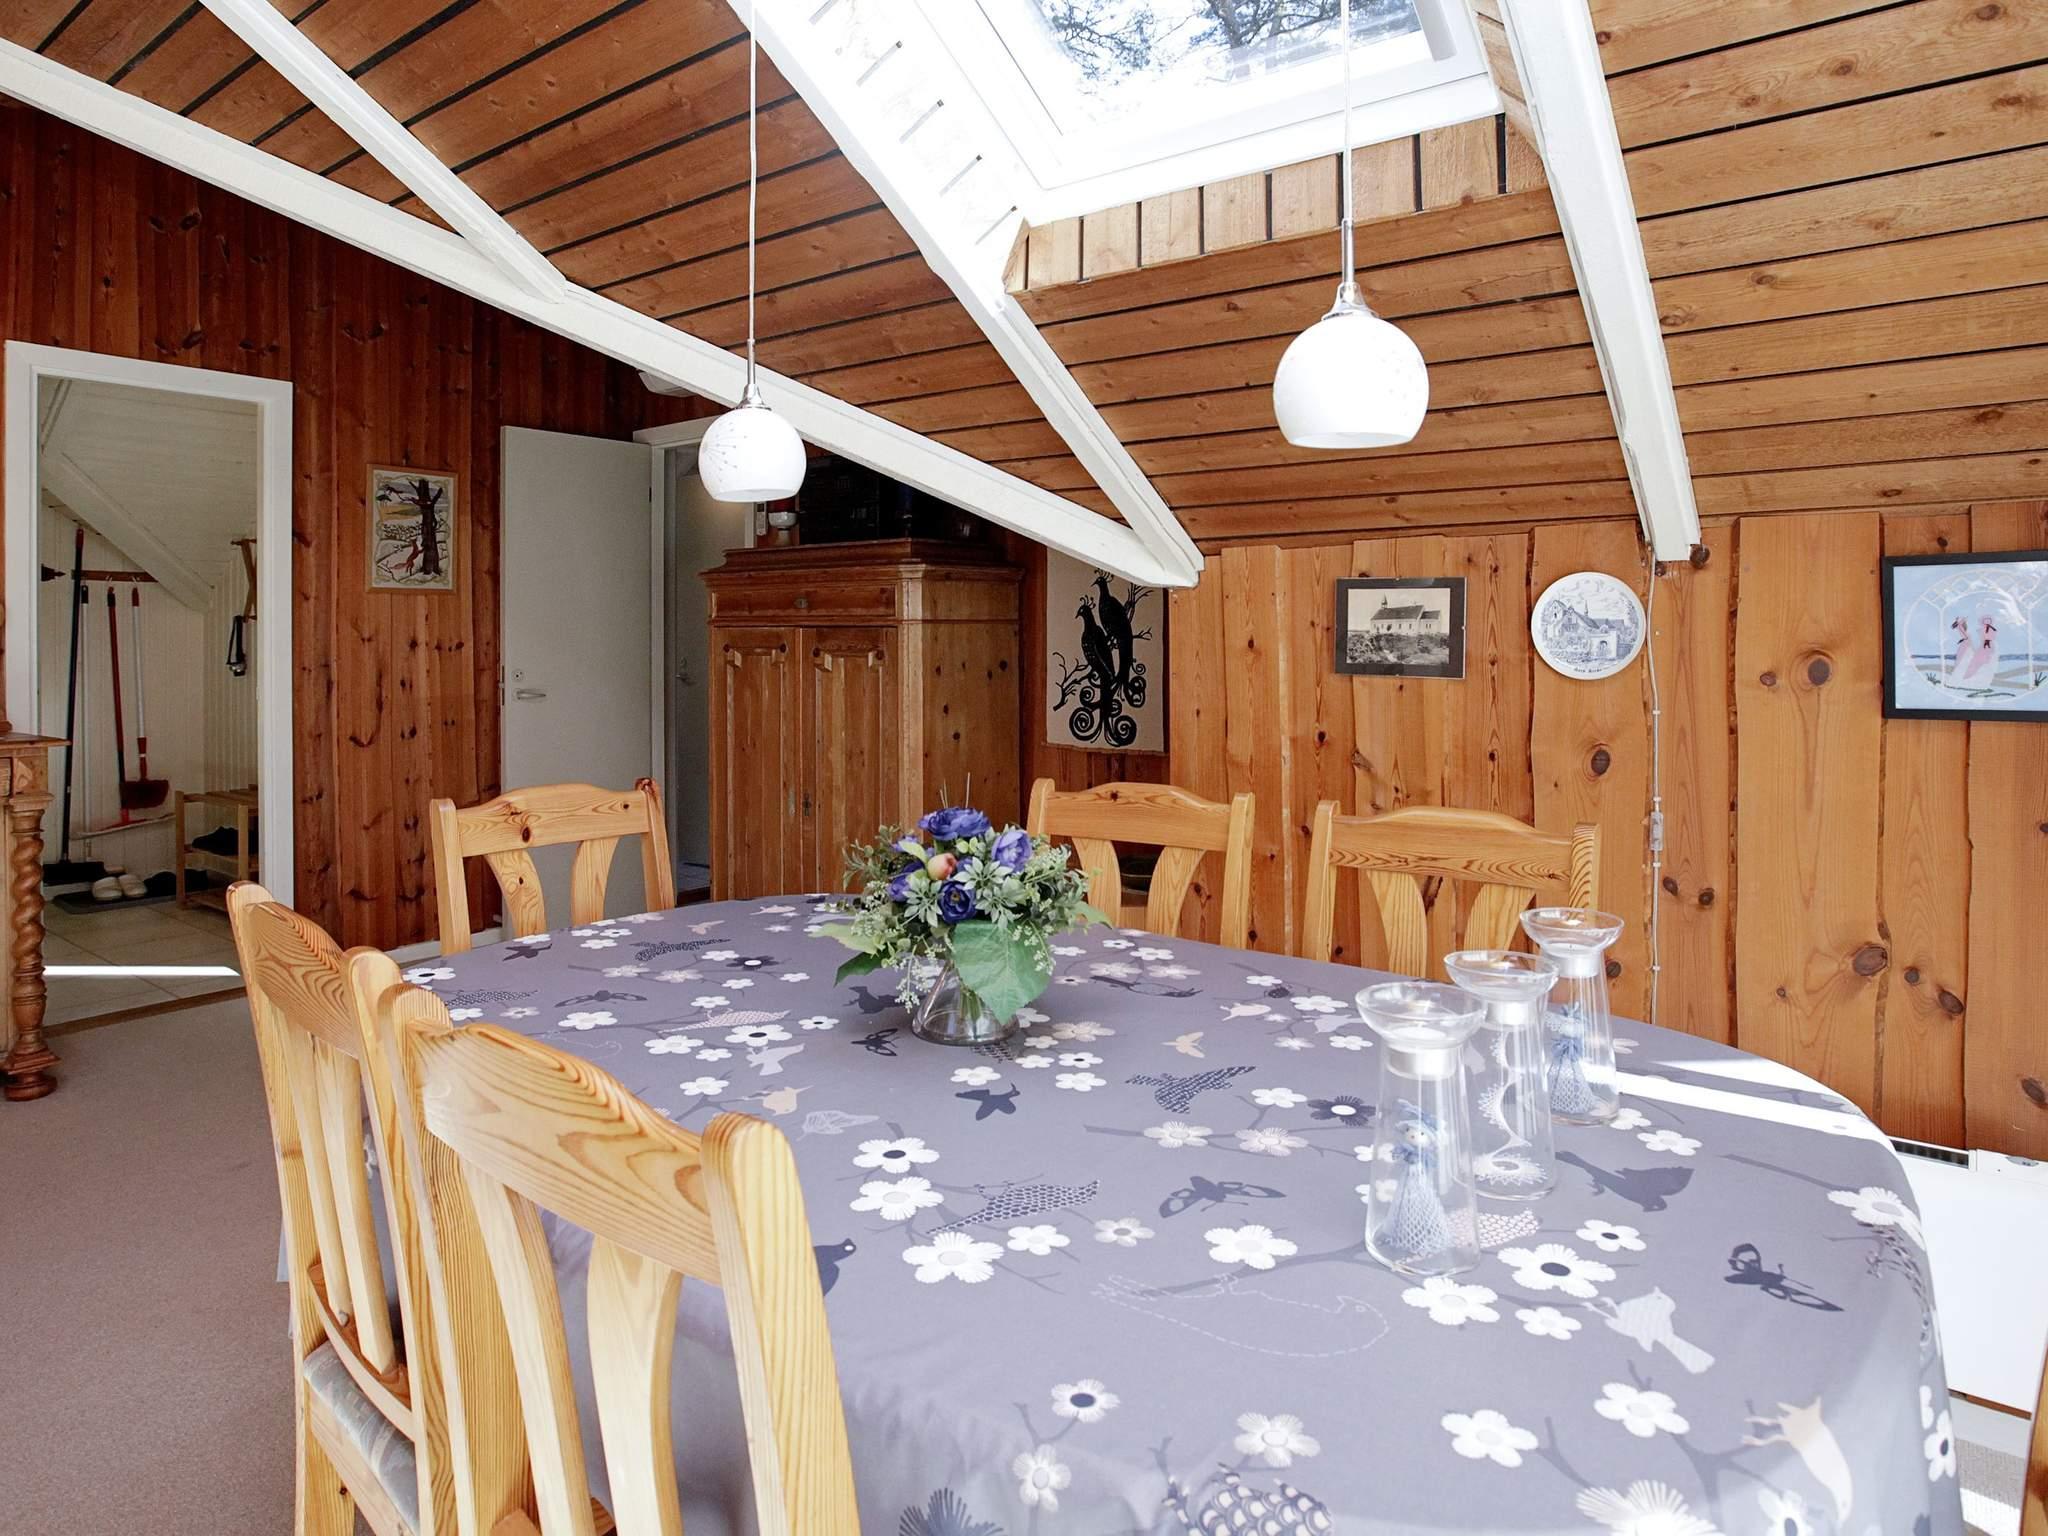 Ferienhaus Hou Nord/Melholt (88048), Hou, , Nordostjütland, Dänemark, Bild 10